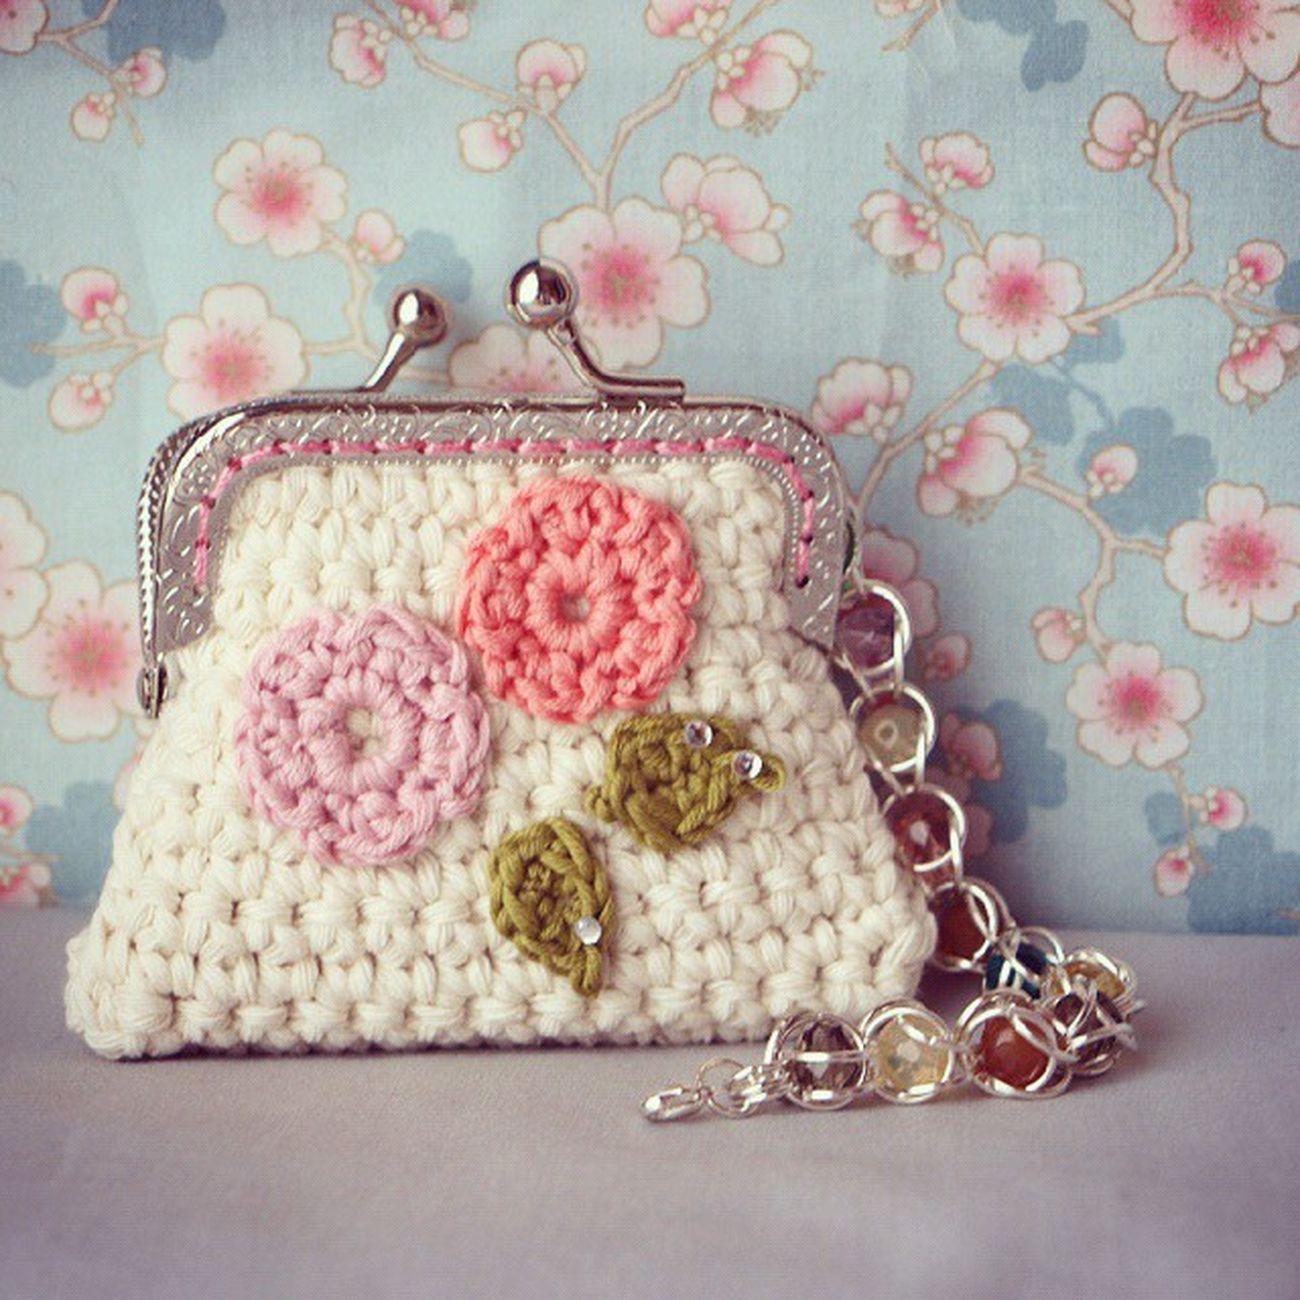 Monedero Crochet Coinpurse Vintage Shabbychic Handmade Sweet Bracelet Crystal Love